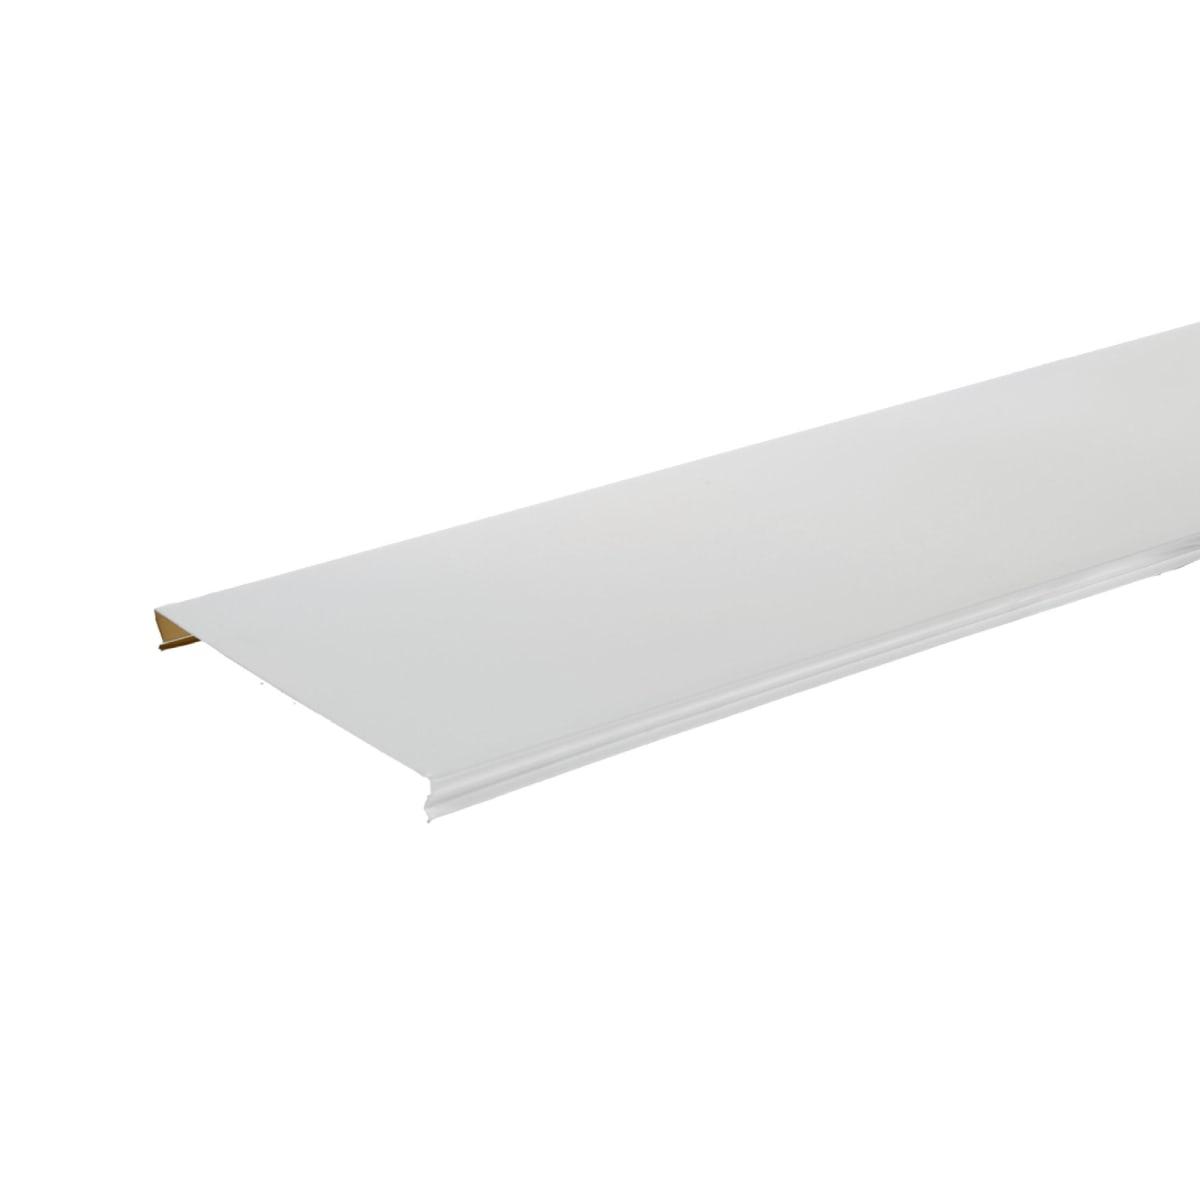 Набор реек Artens 3х1.05 м цвет белый матовый